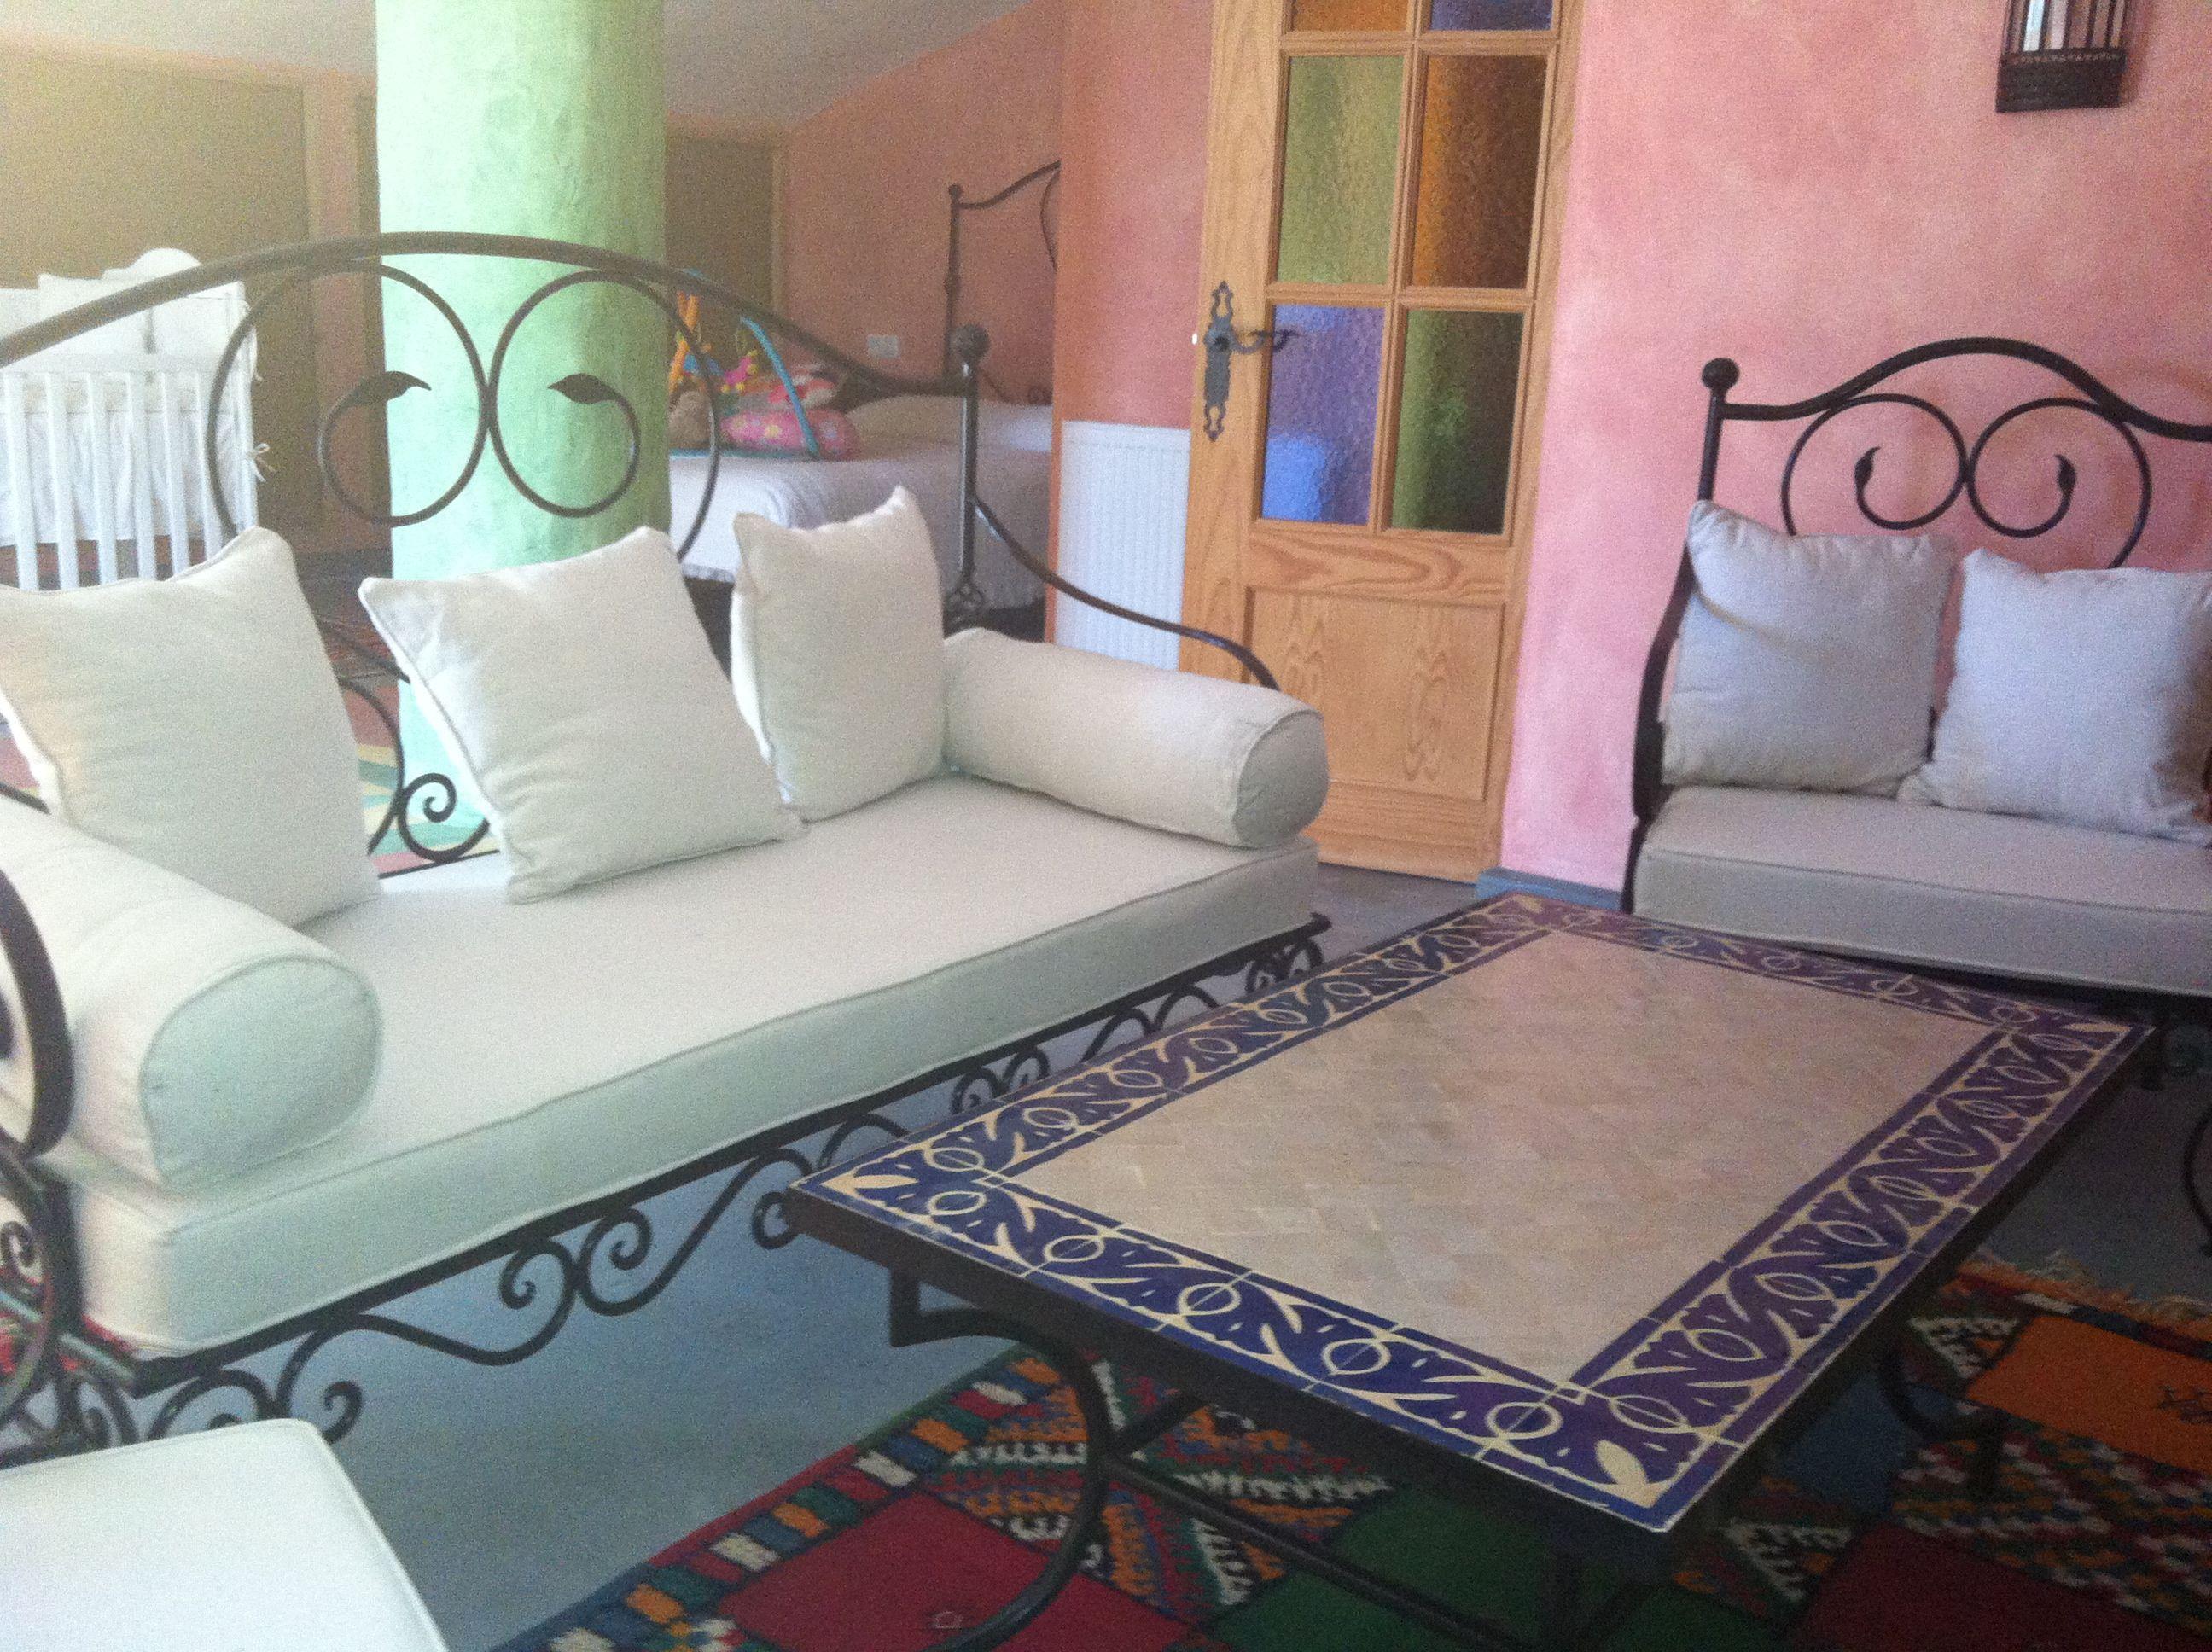 Sofa de forja tresillo almamed pinterest sof for Sofas el tresillo